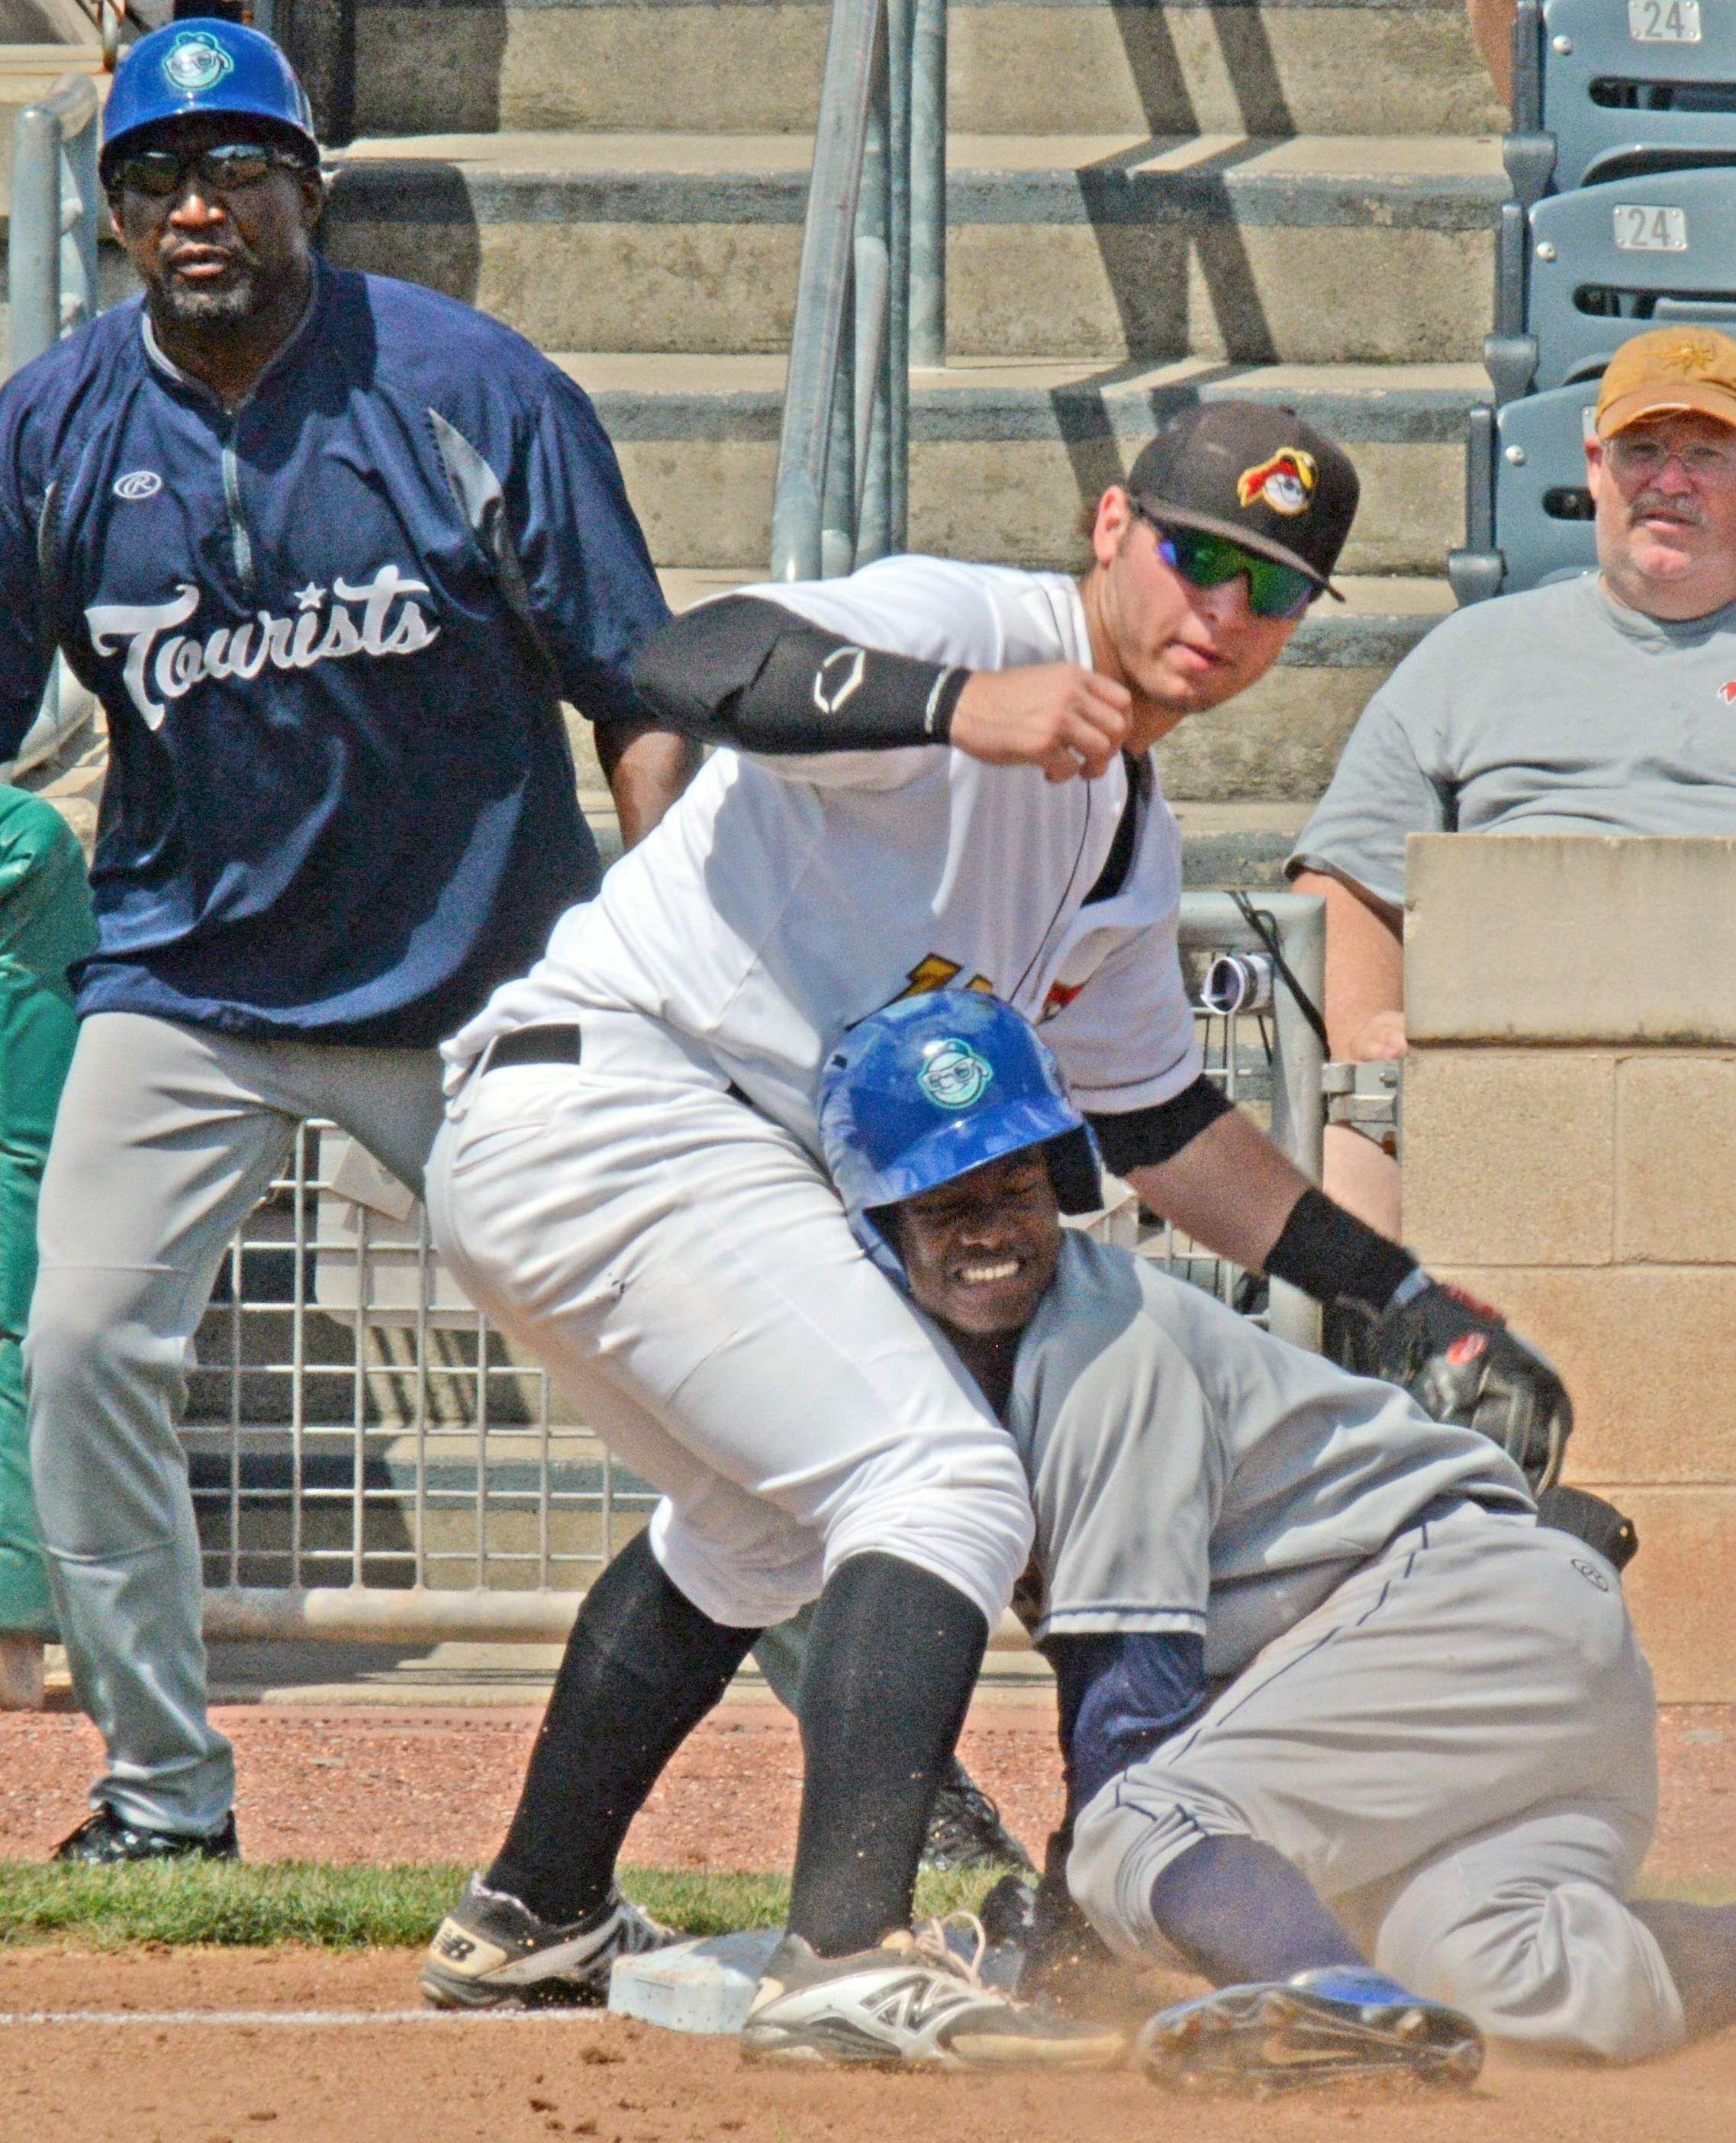 Power Baseball Improved West Virginia Team Wraps Up 2014 Season West Virginia Power Minor League Baseball